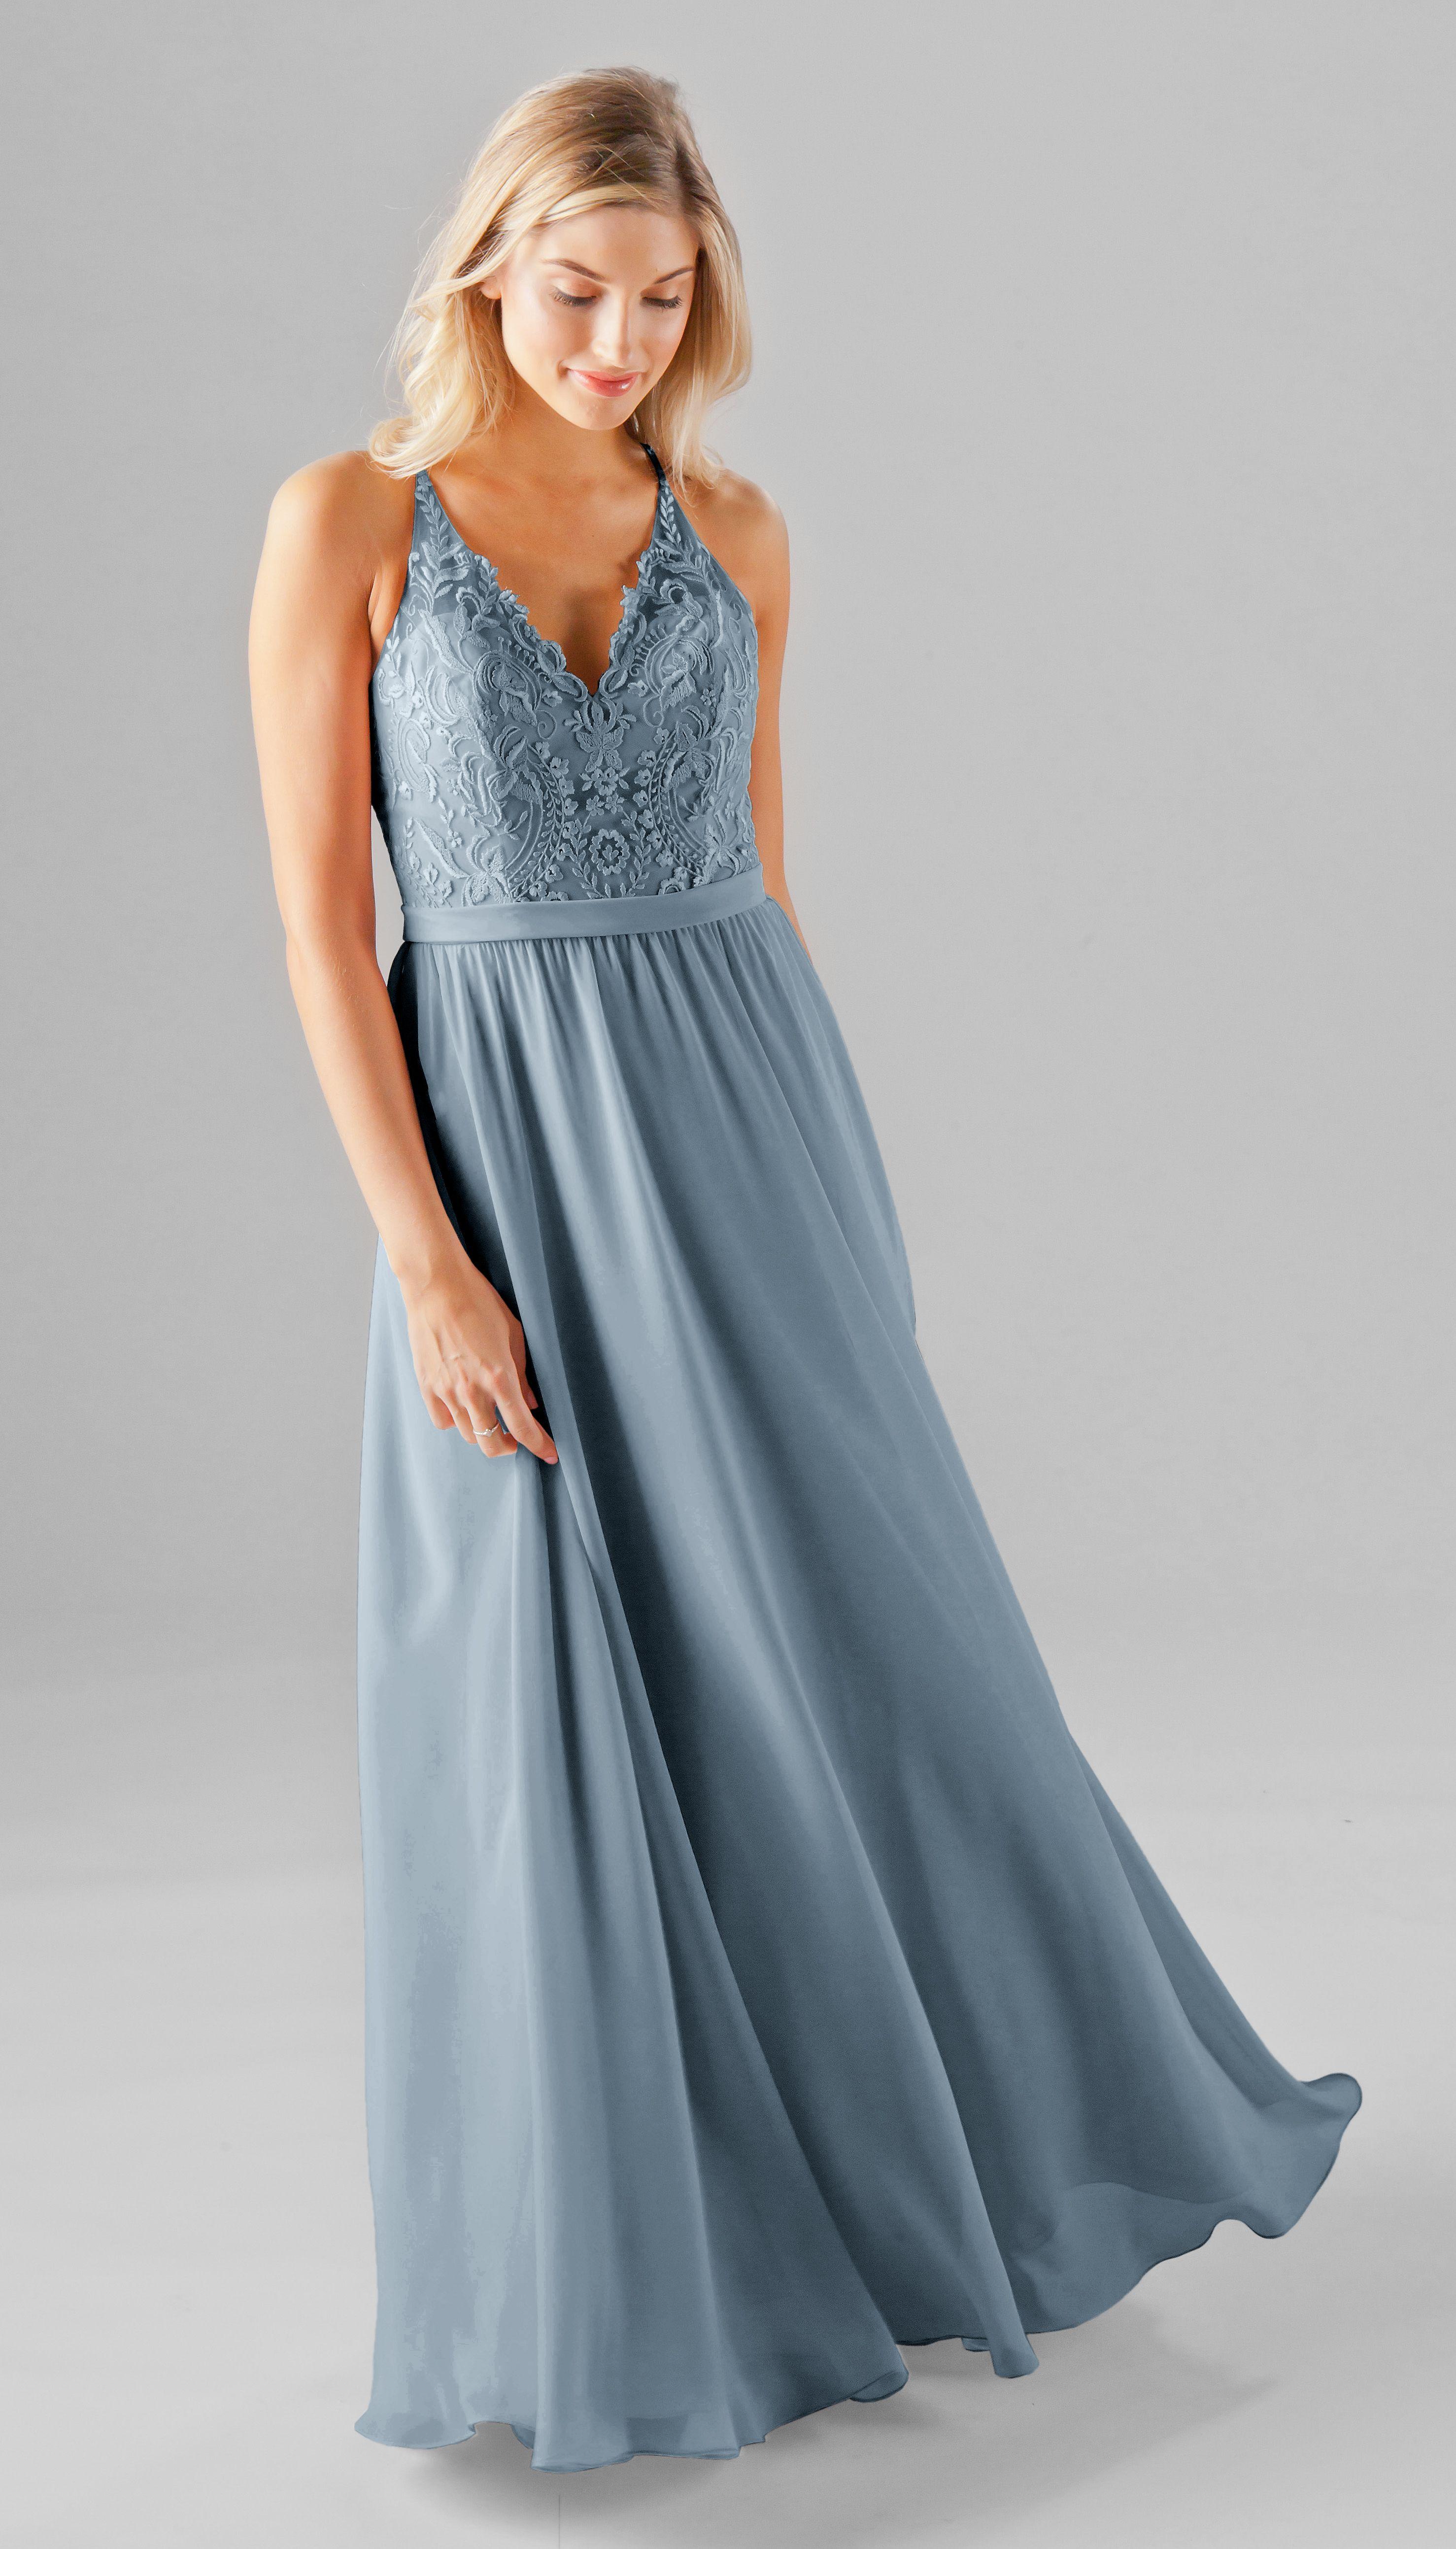 Iris blue bridesmaid dresses pinterest iris romantic and